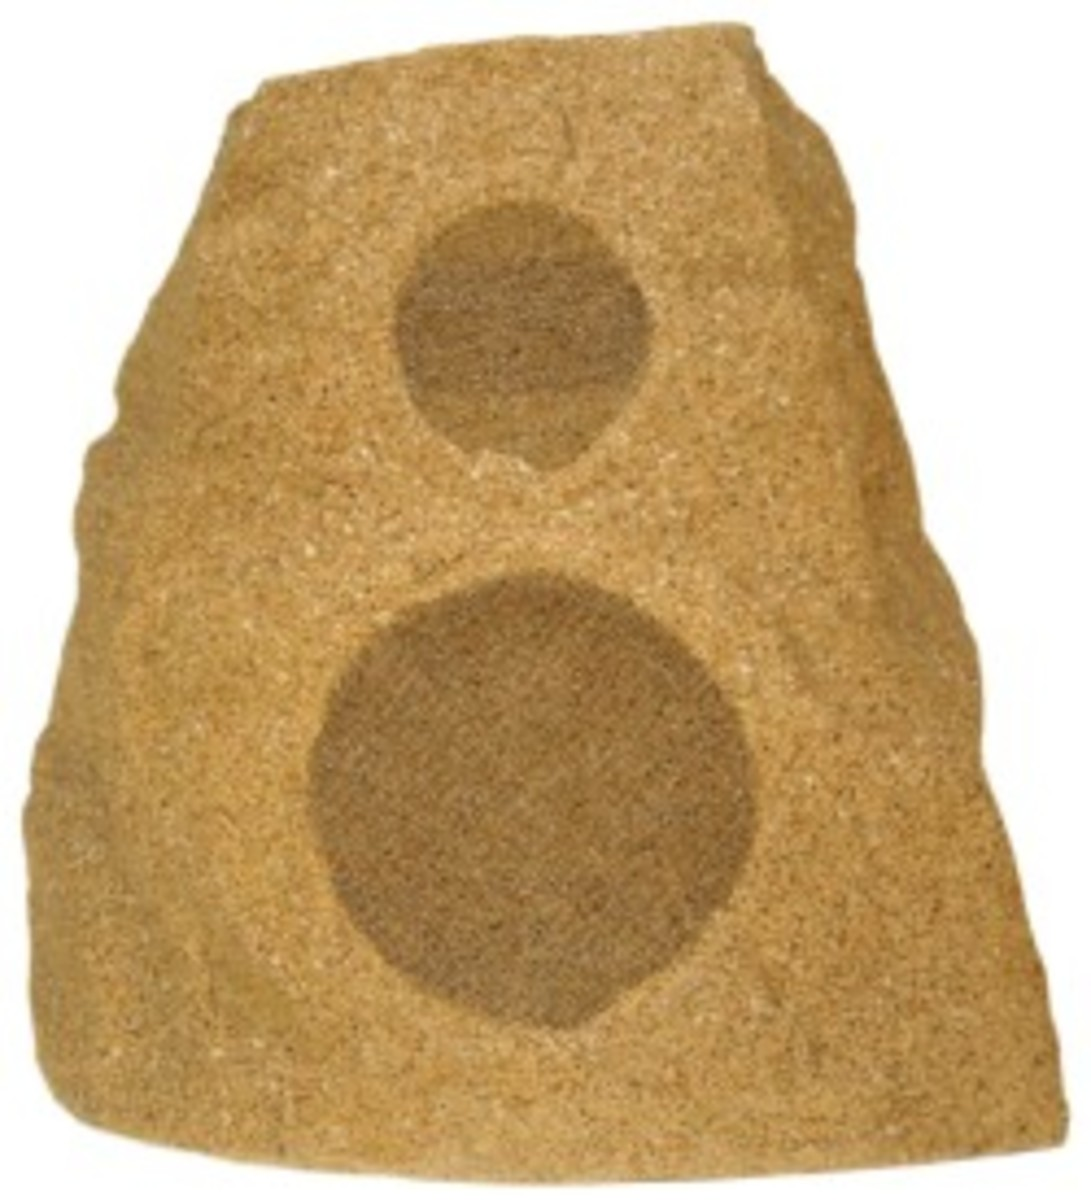 klipschrock